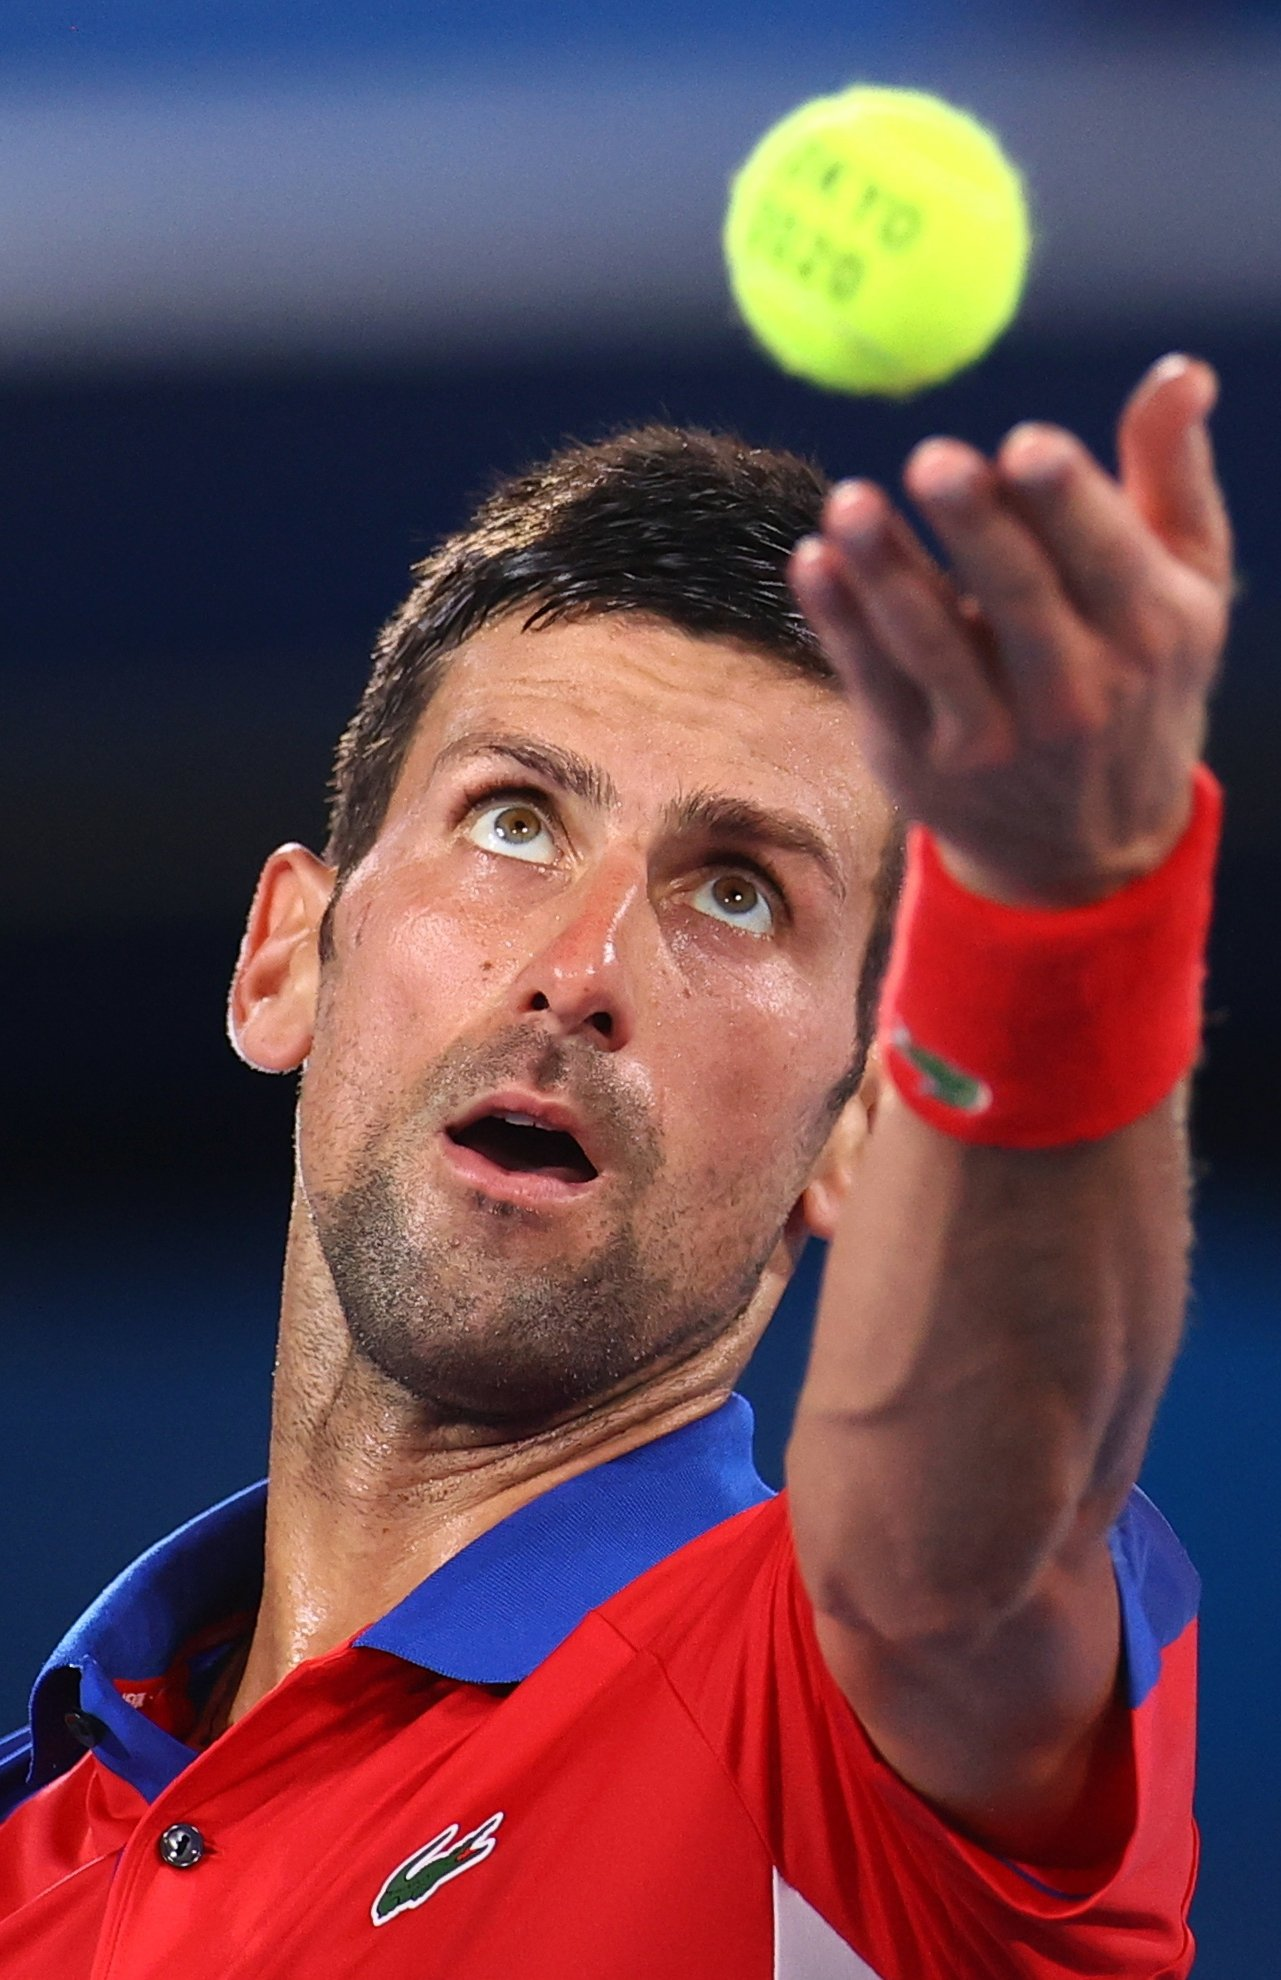 Serbia's Novak Djokovic in action during Tokyo 2020 Games tennis men's singles quarterfinal match Japan's Kei Nishikori,Ariake Tennis Park, Tokyo, Japan, July 29, 2021 (Reuters Photo)